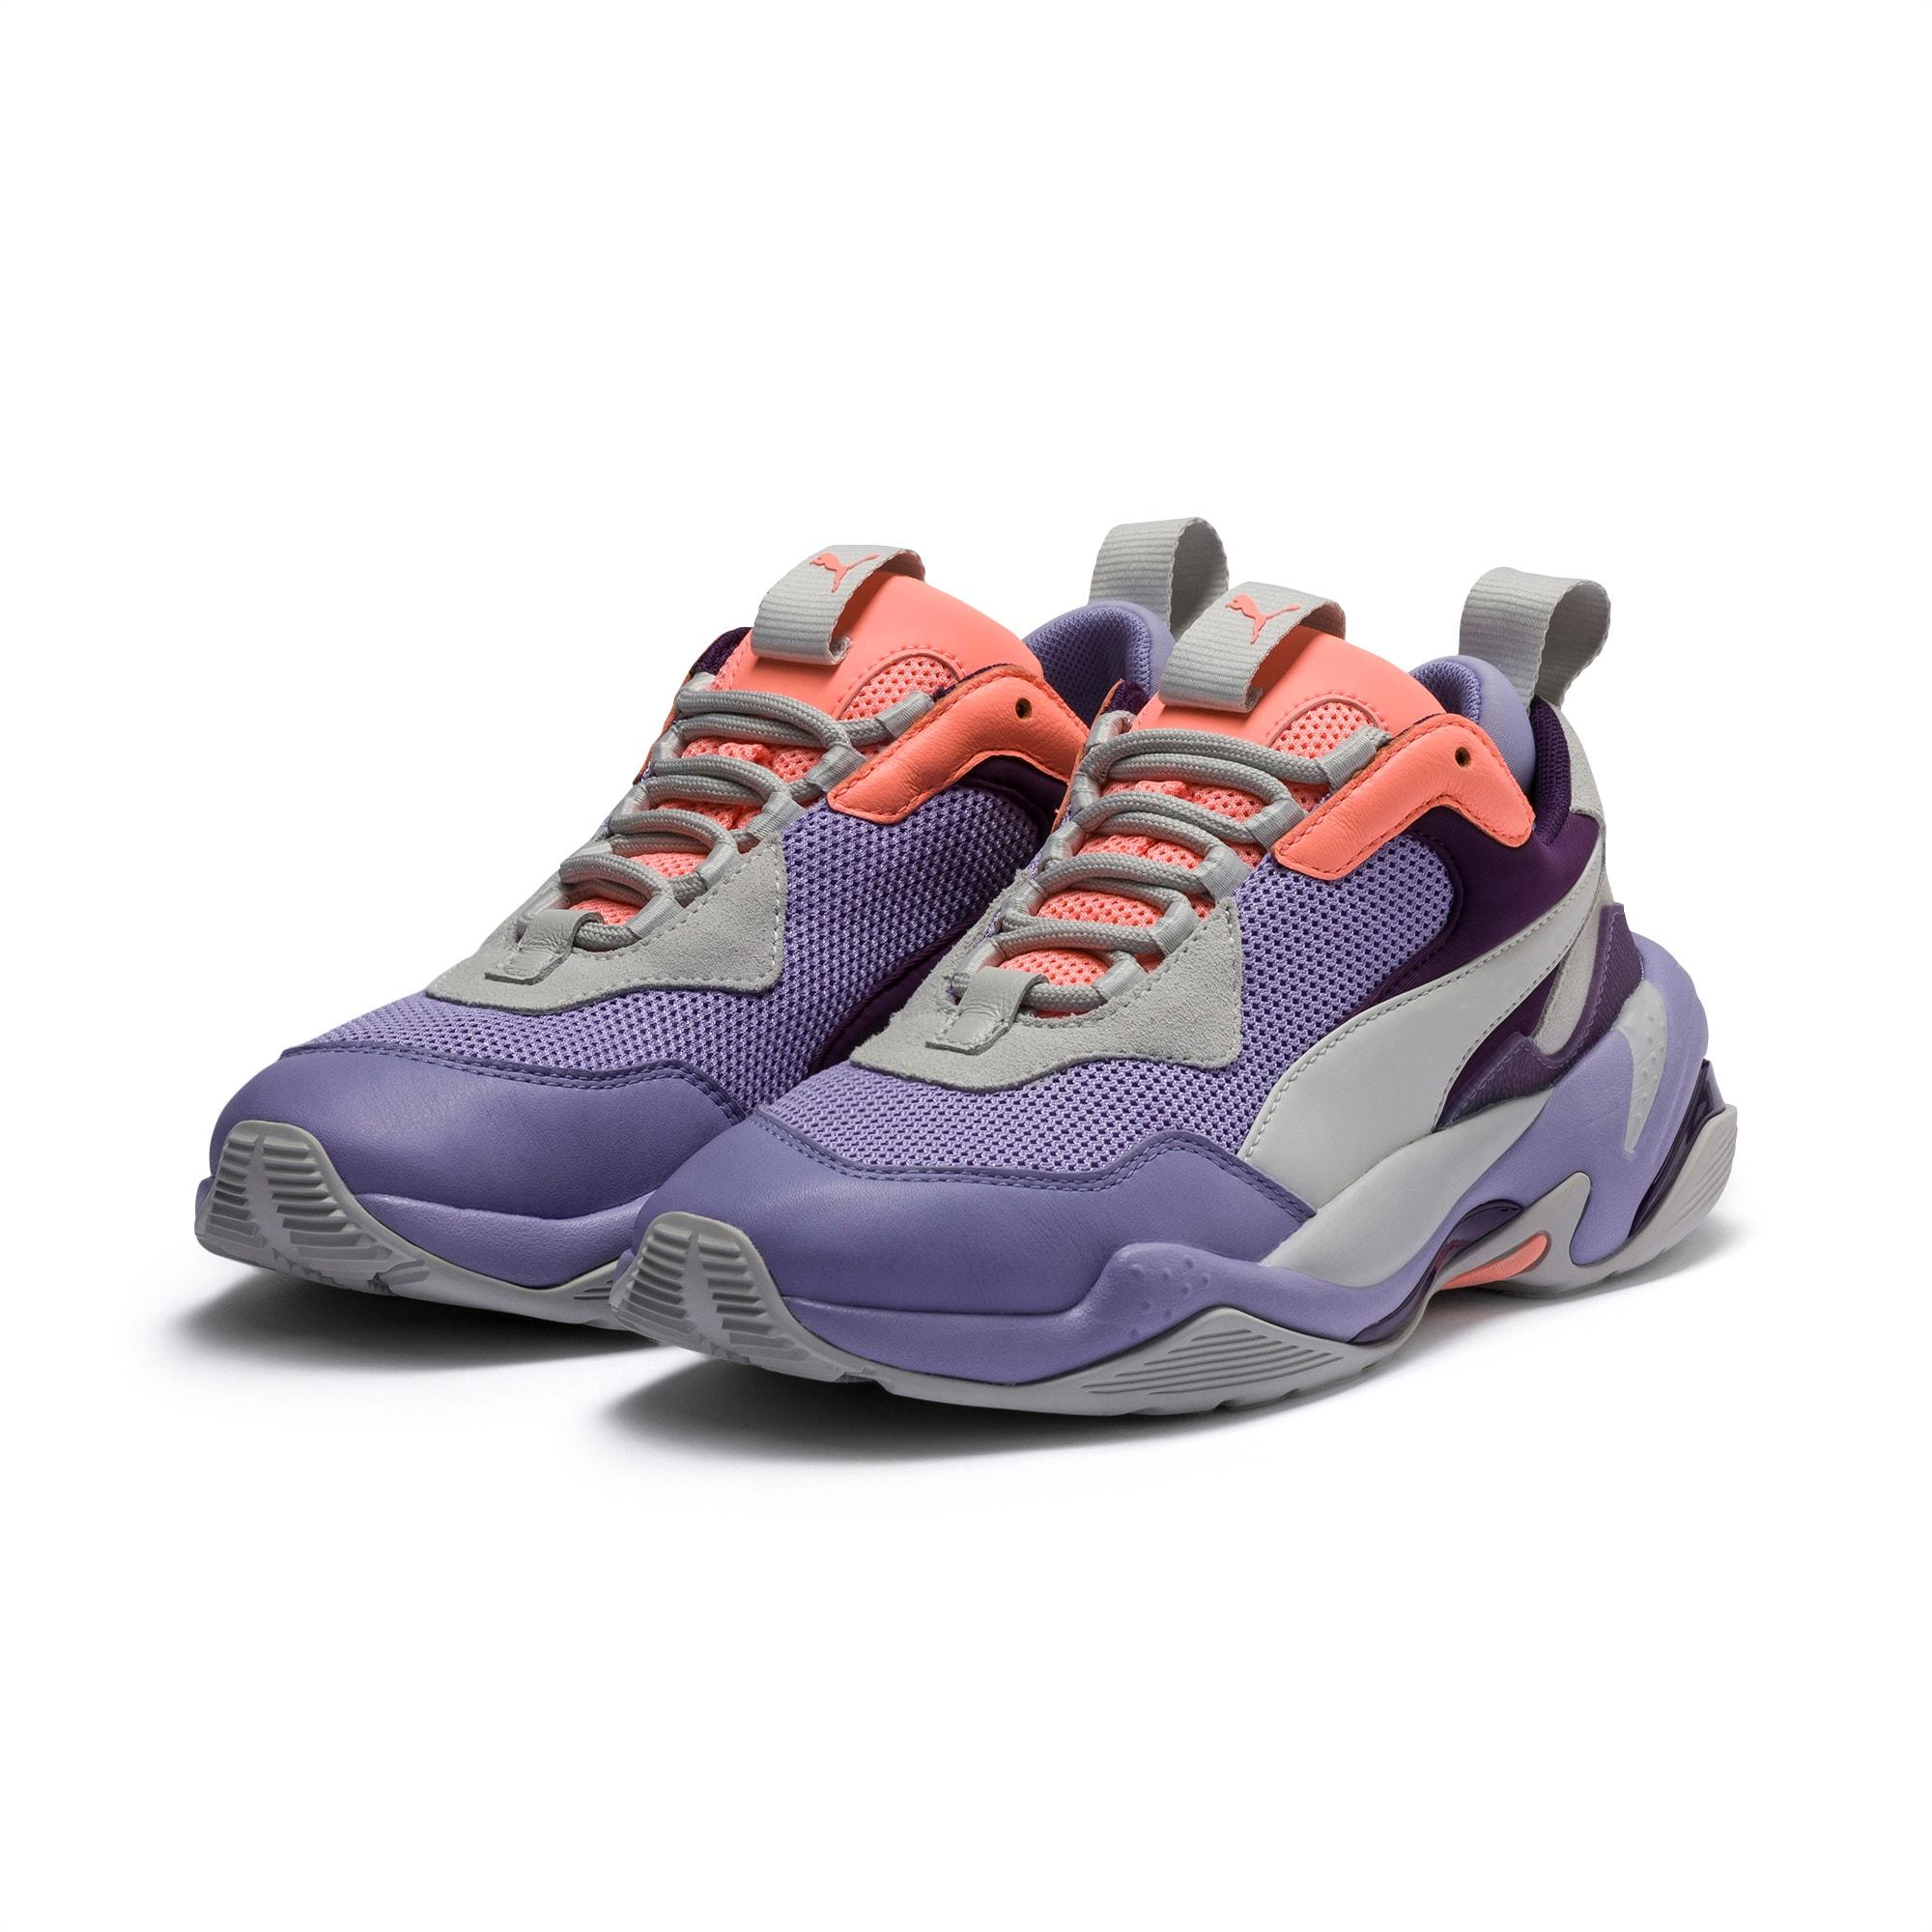 Sneakers Thunder Spectra | 10 | Offerte Speciali Puma | Puma